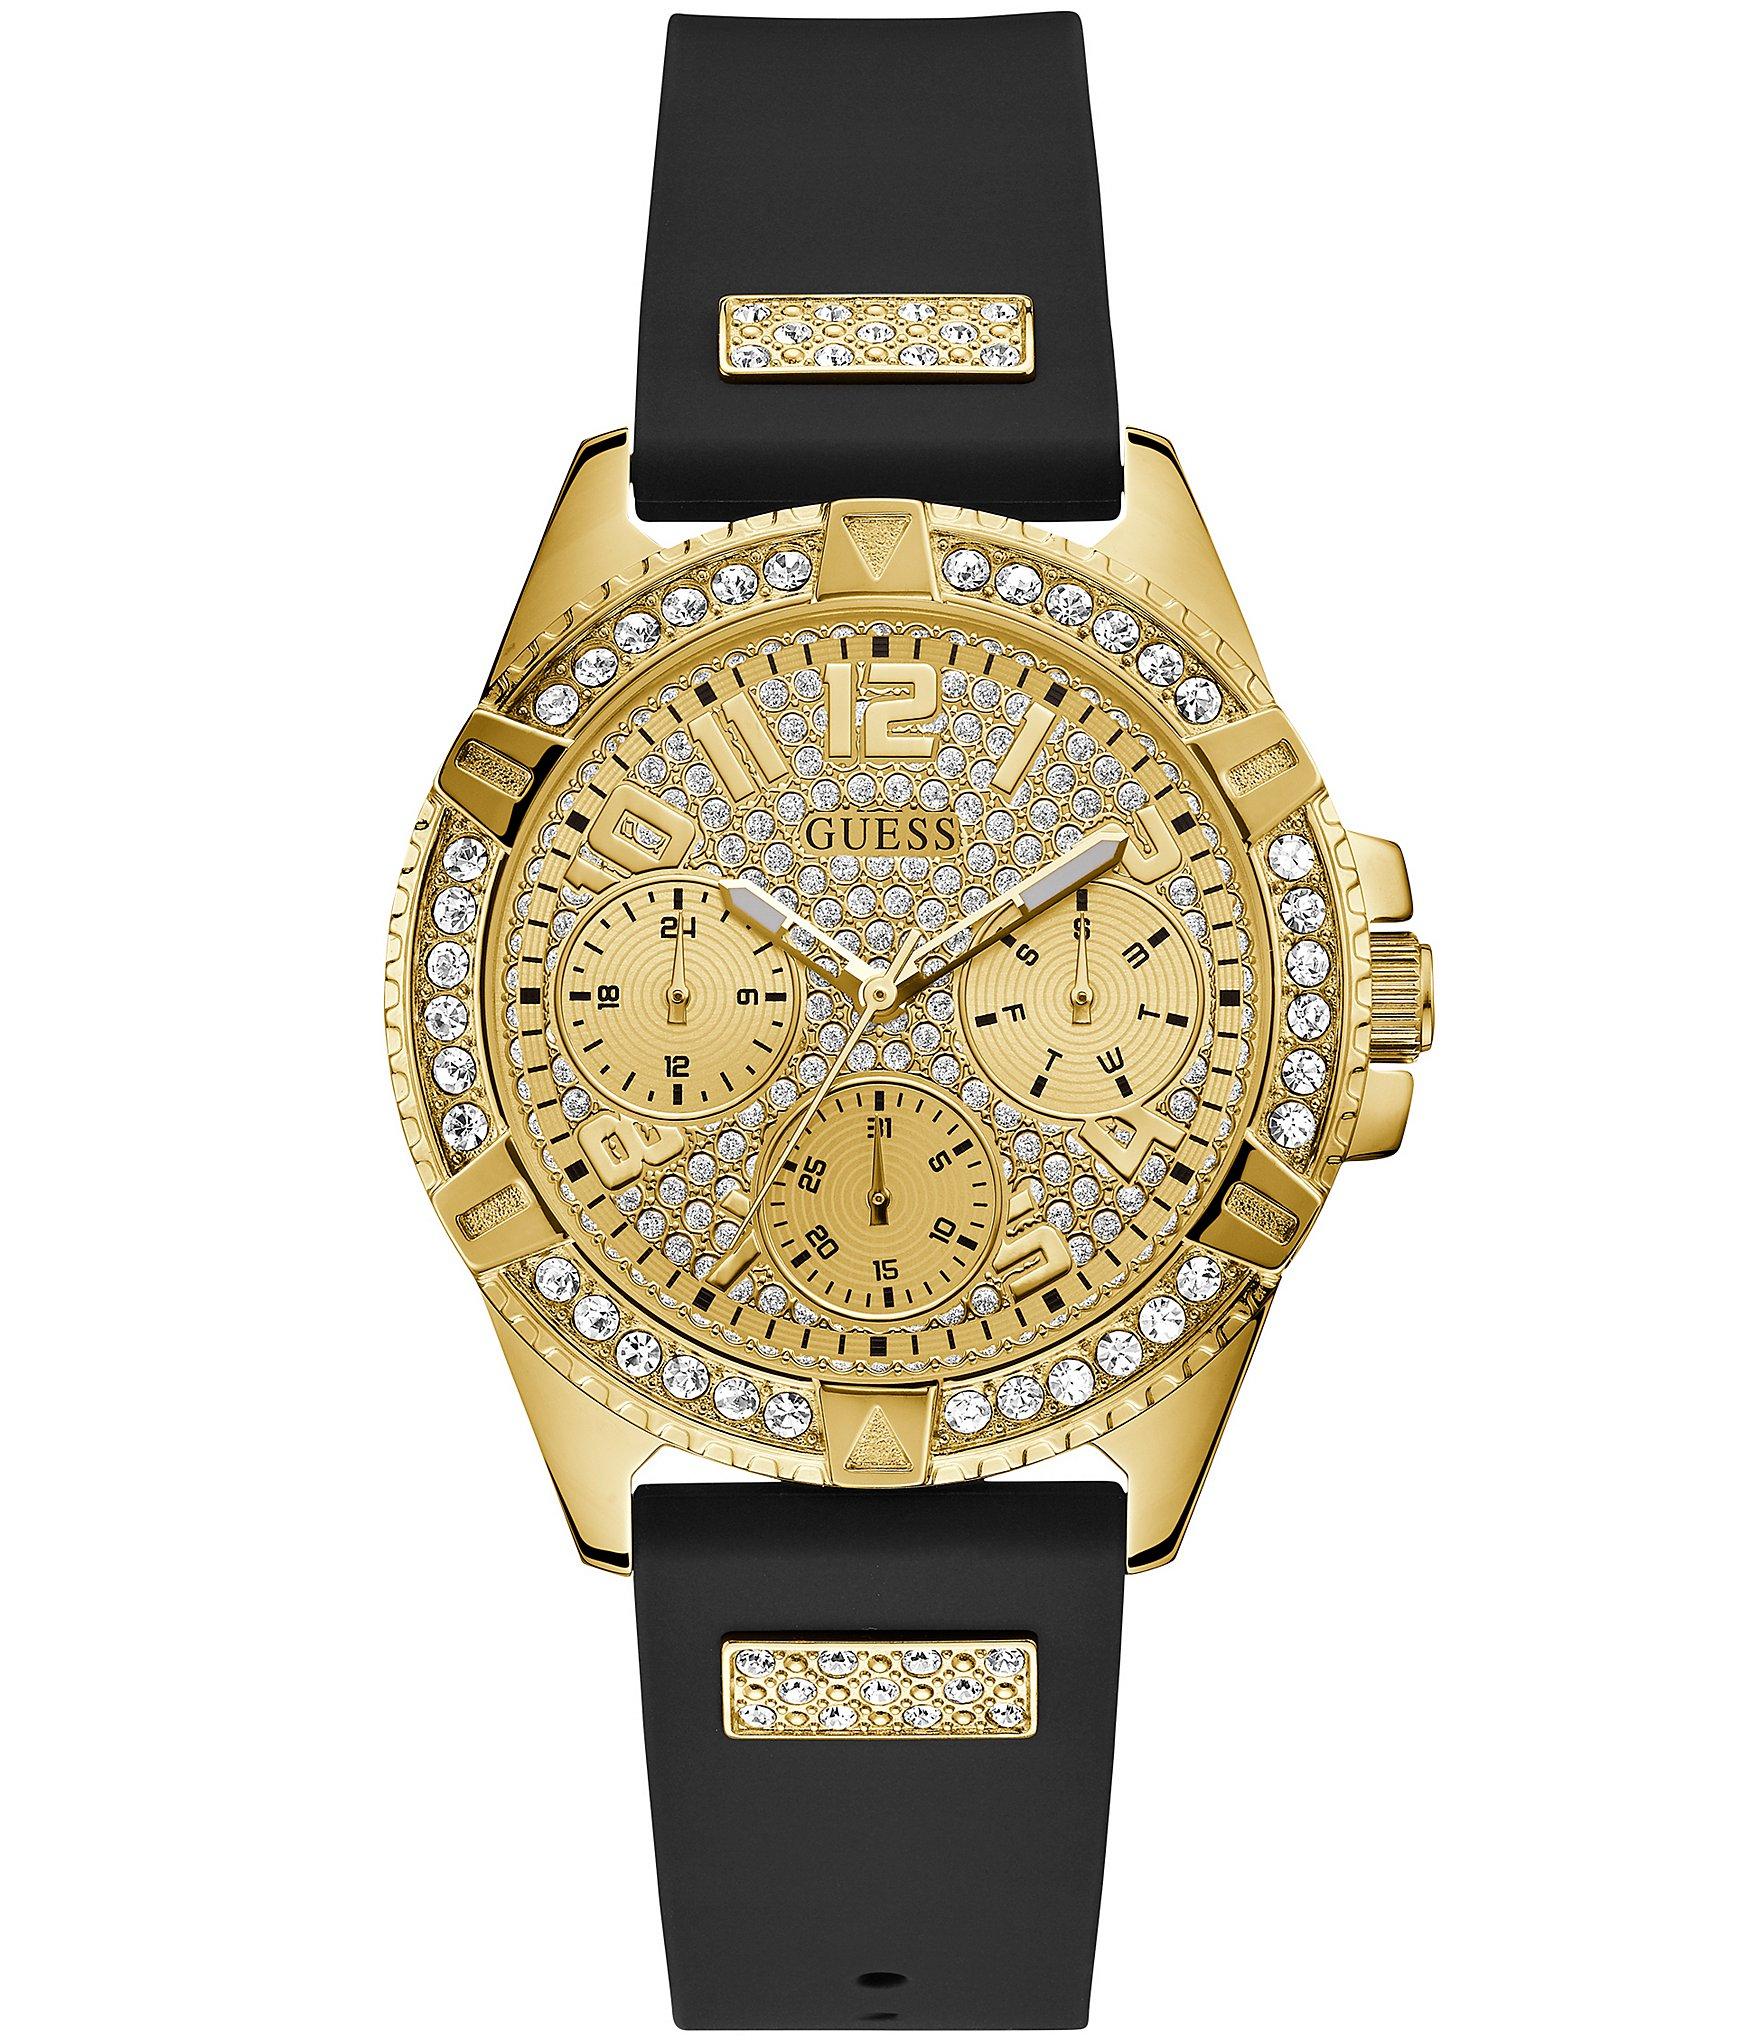 Guess Gold Bling Watch